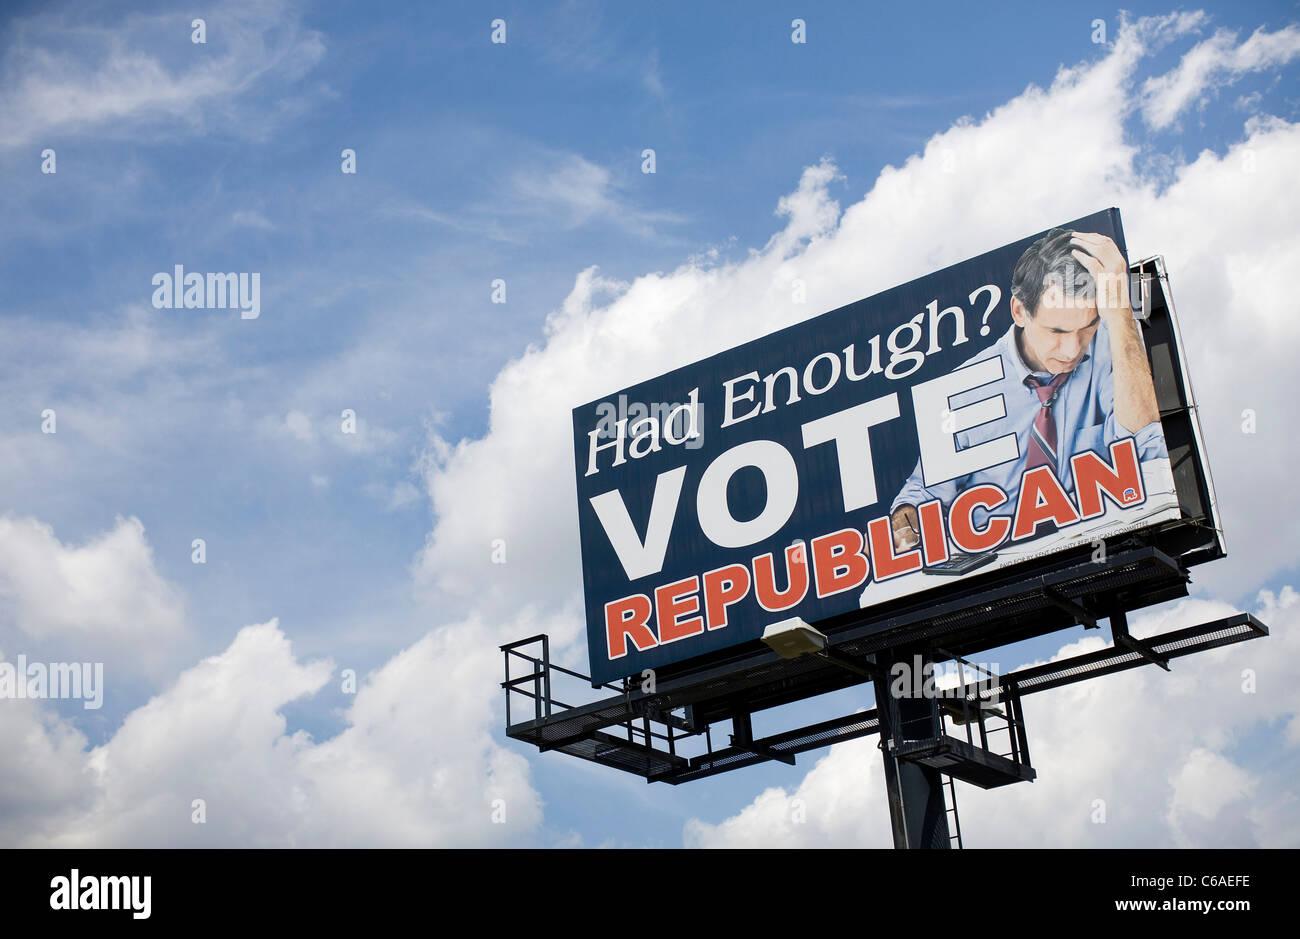 A Republican Party billboard.  - Stock Image